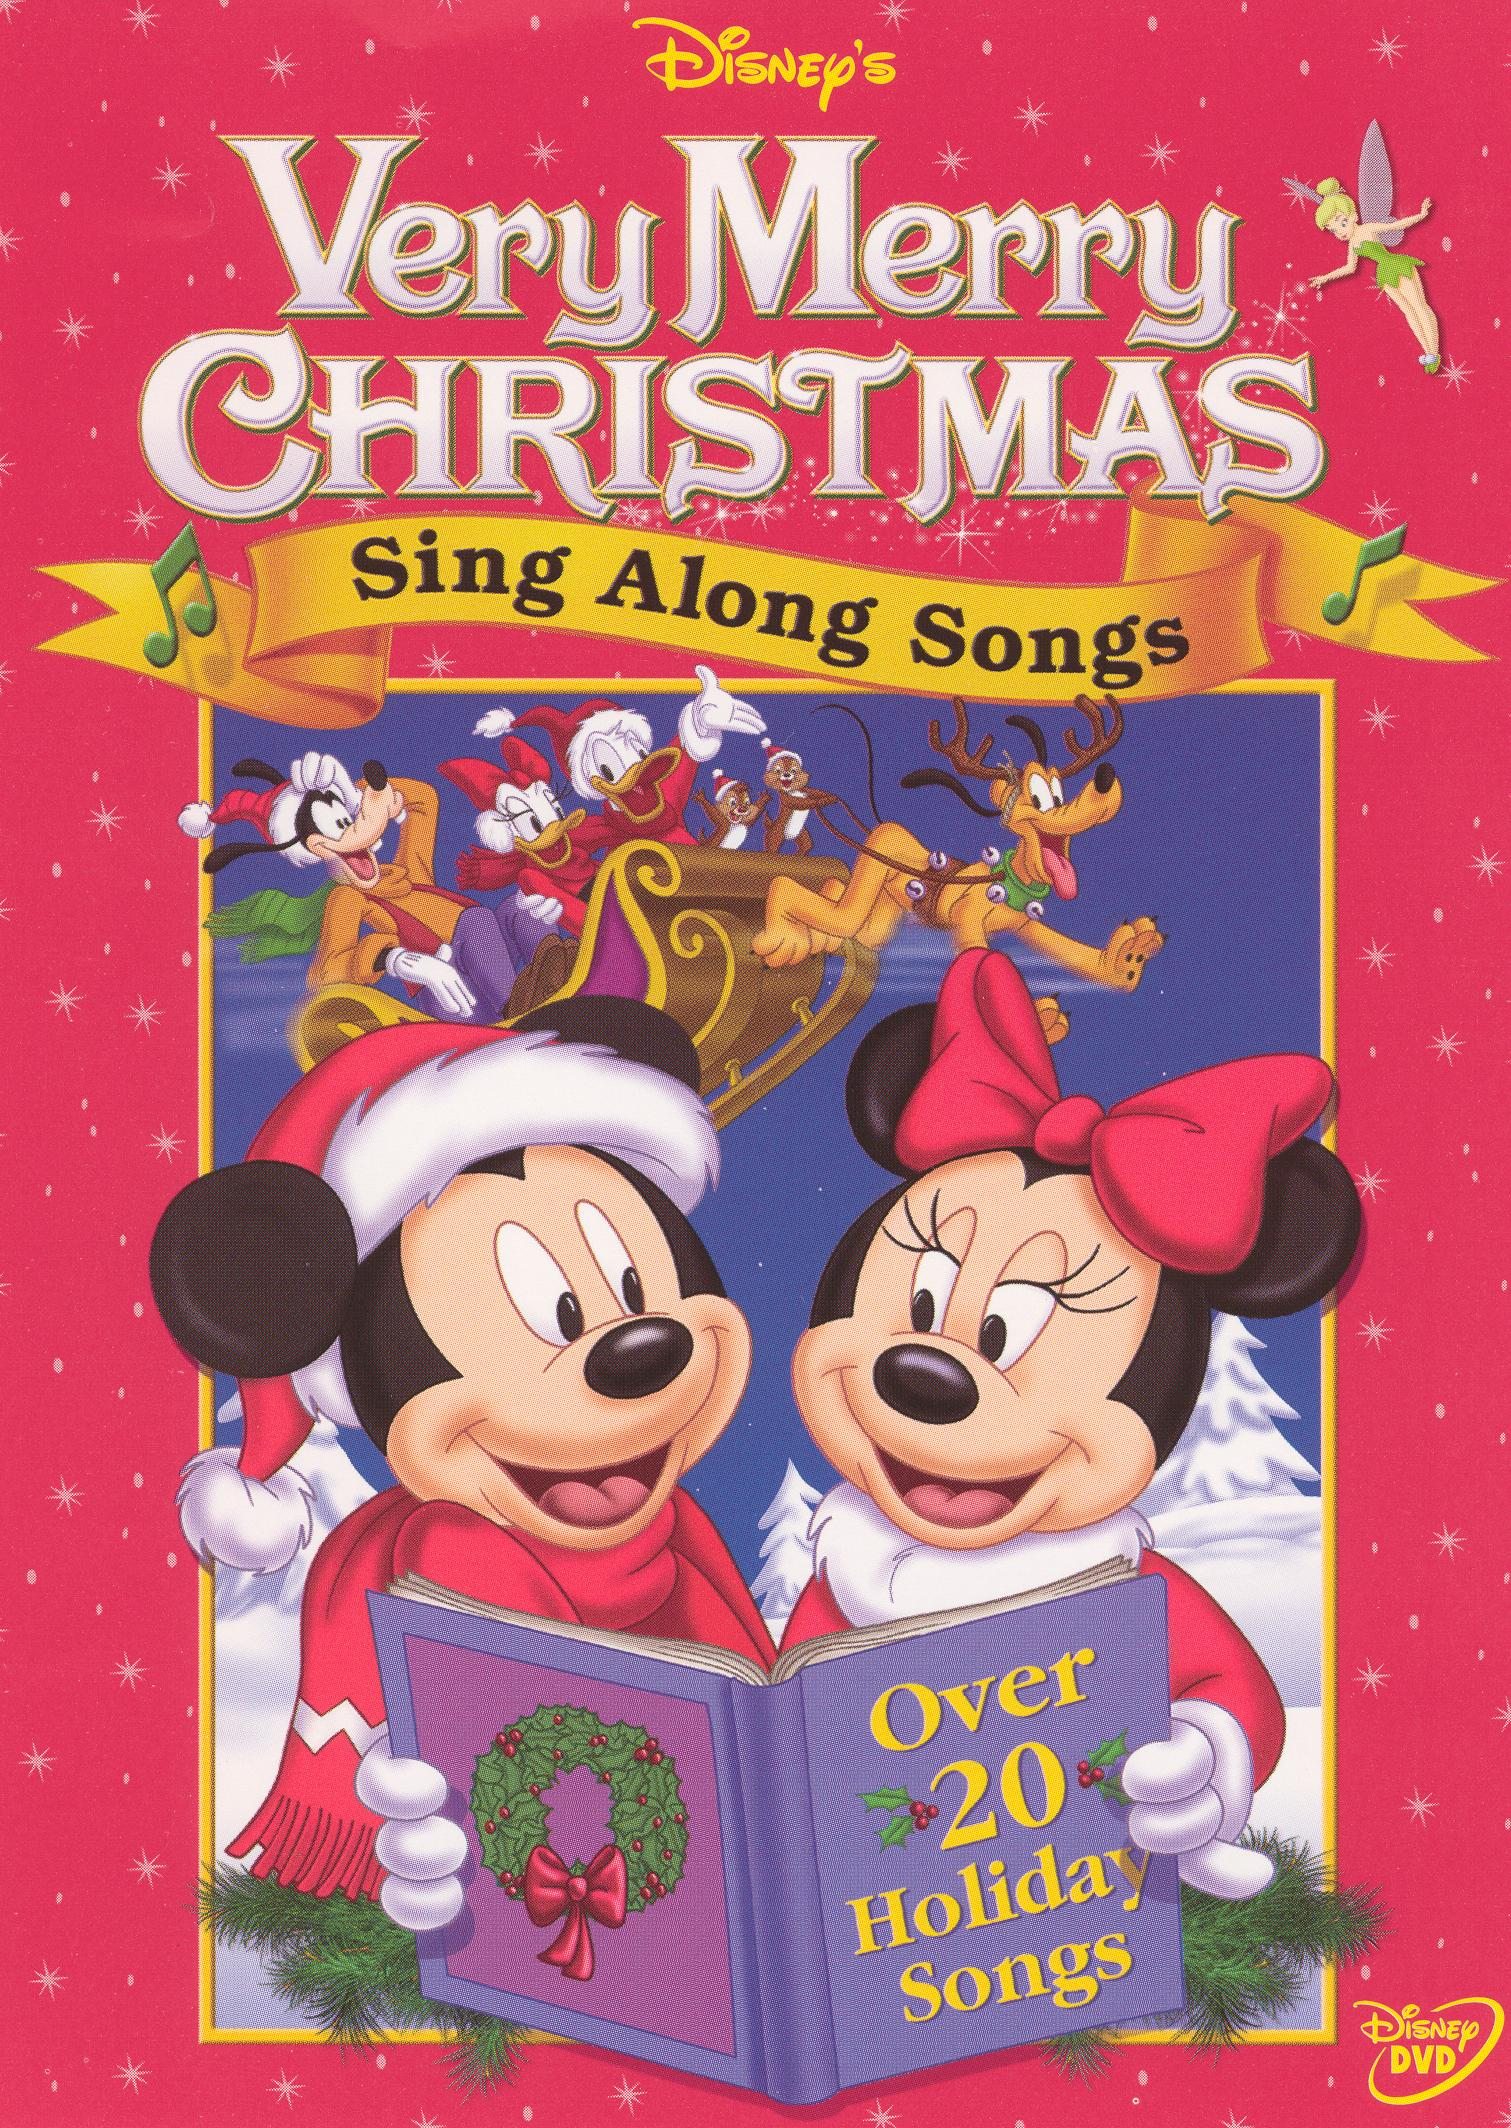 Disney's Sing Along Songs: Very Merry Christmas Songs